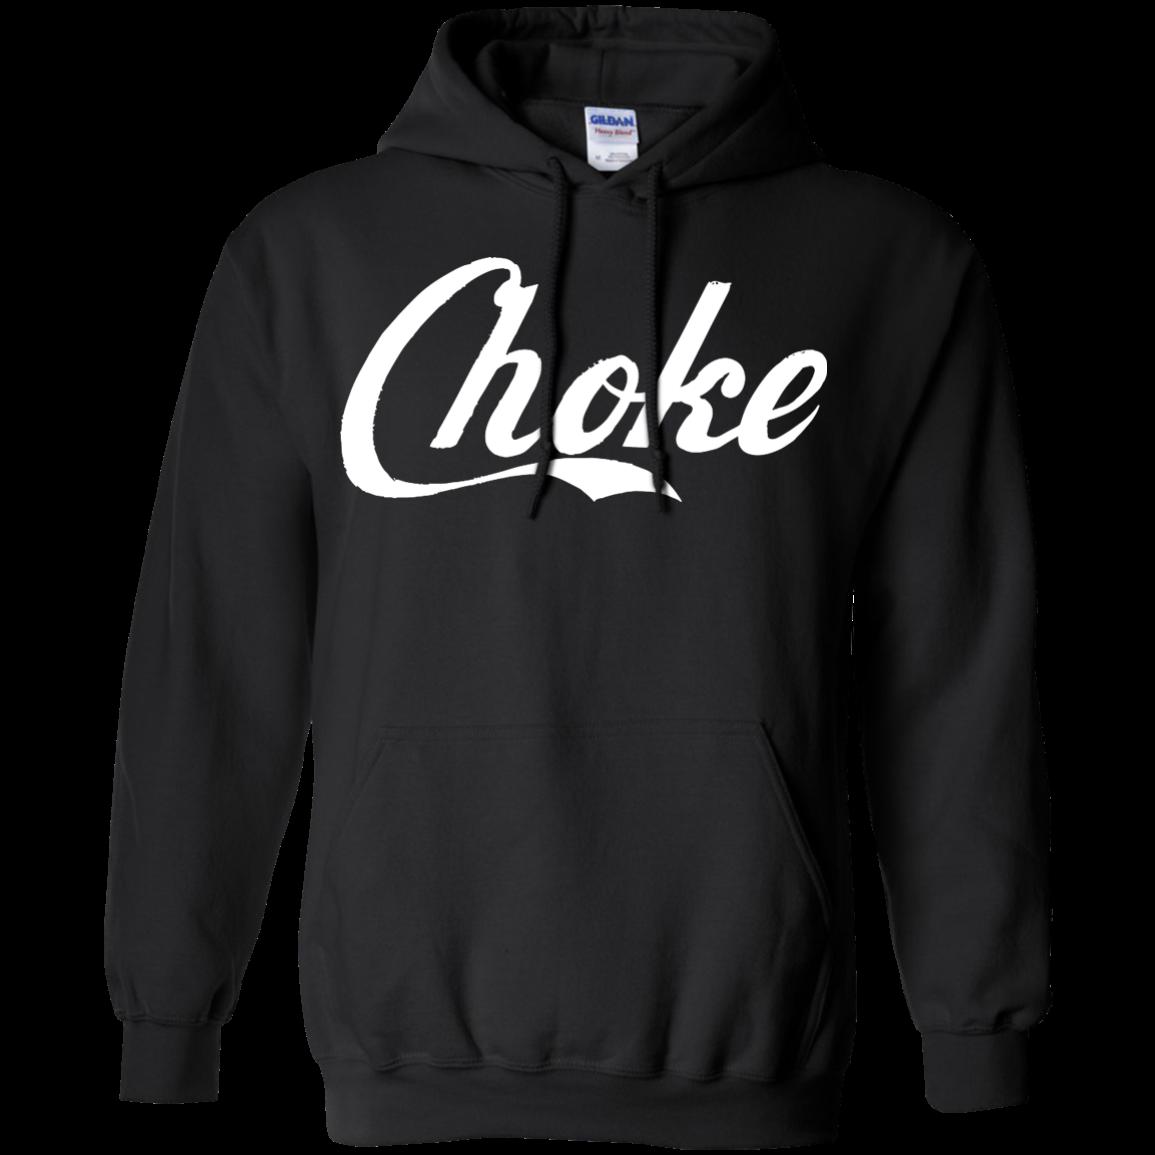 image 1021px Choke Shirt, Choke Logo Coca Cola T Shirts, Hoodies